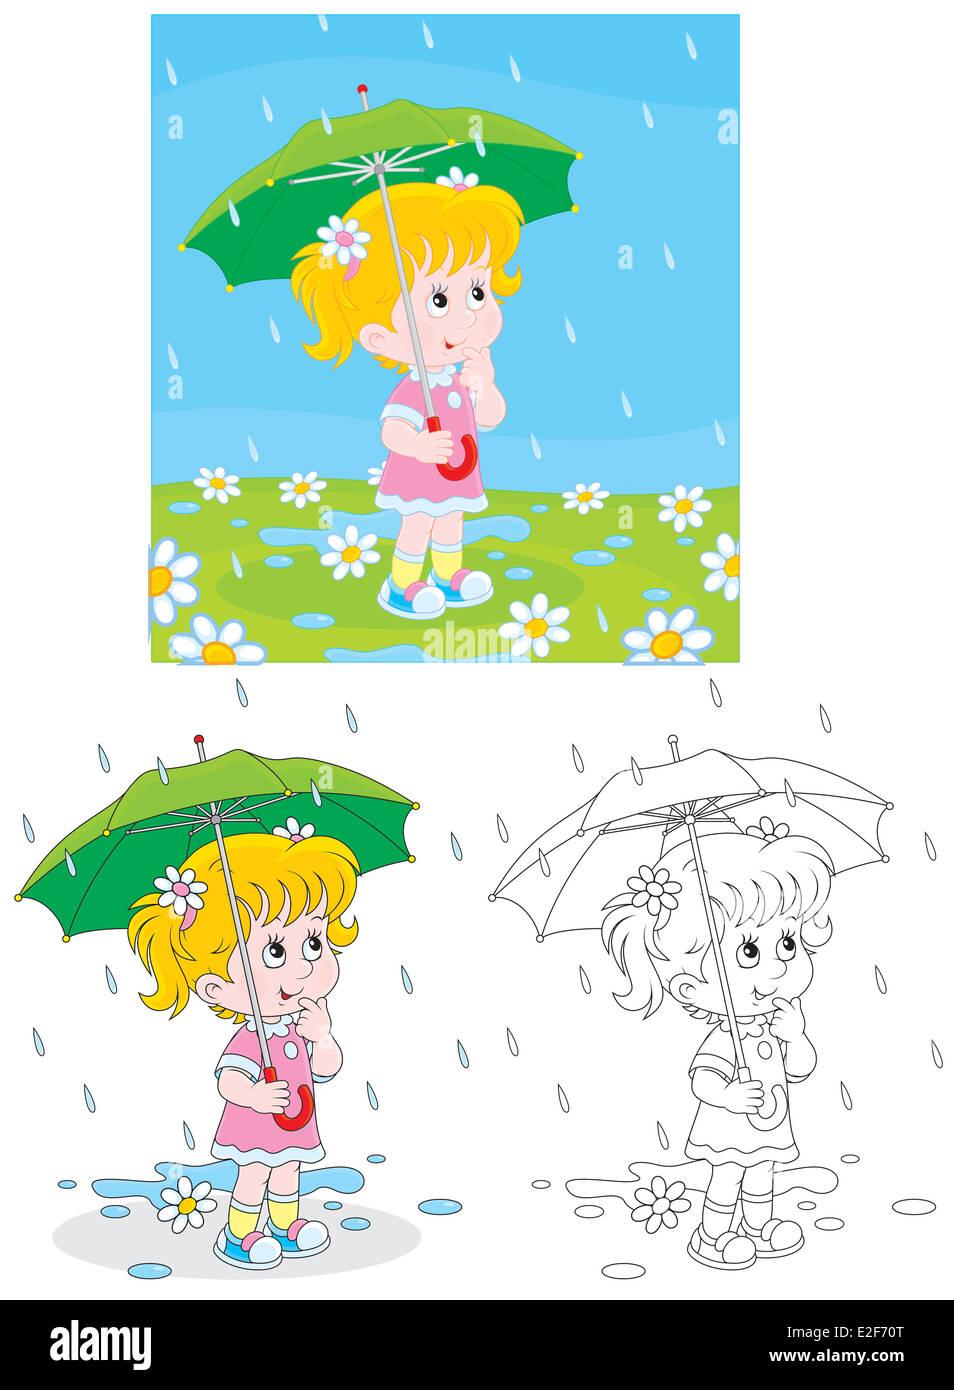 Little girl with an umbrella under rain - Stock Image